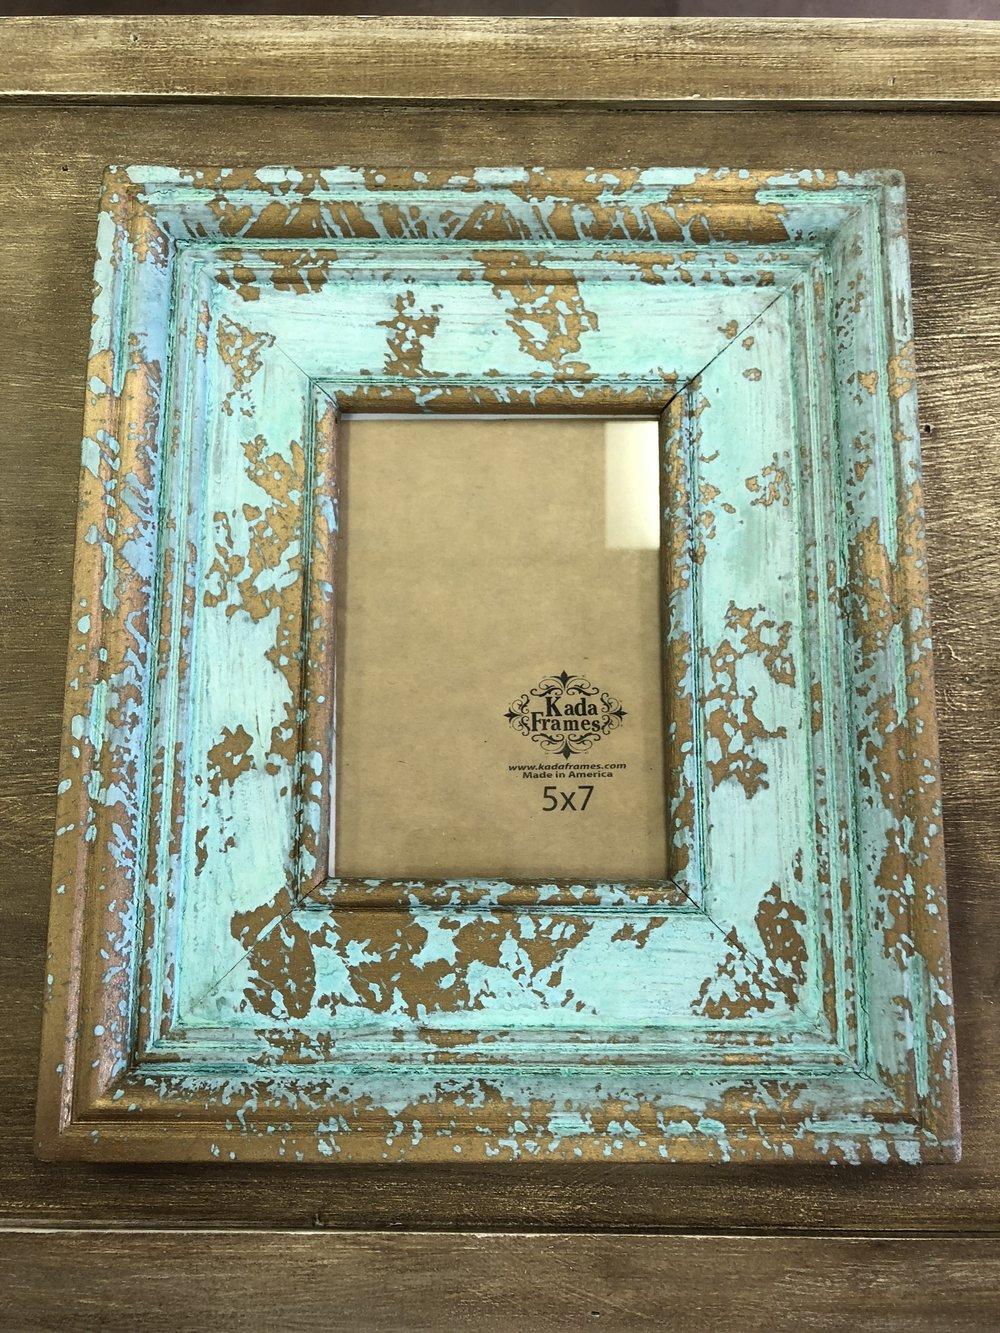 5x7 Tabletop Frame-Patina $44.98